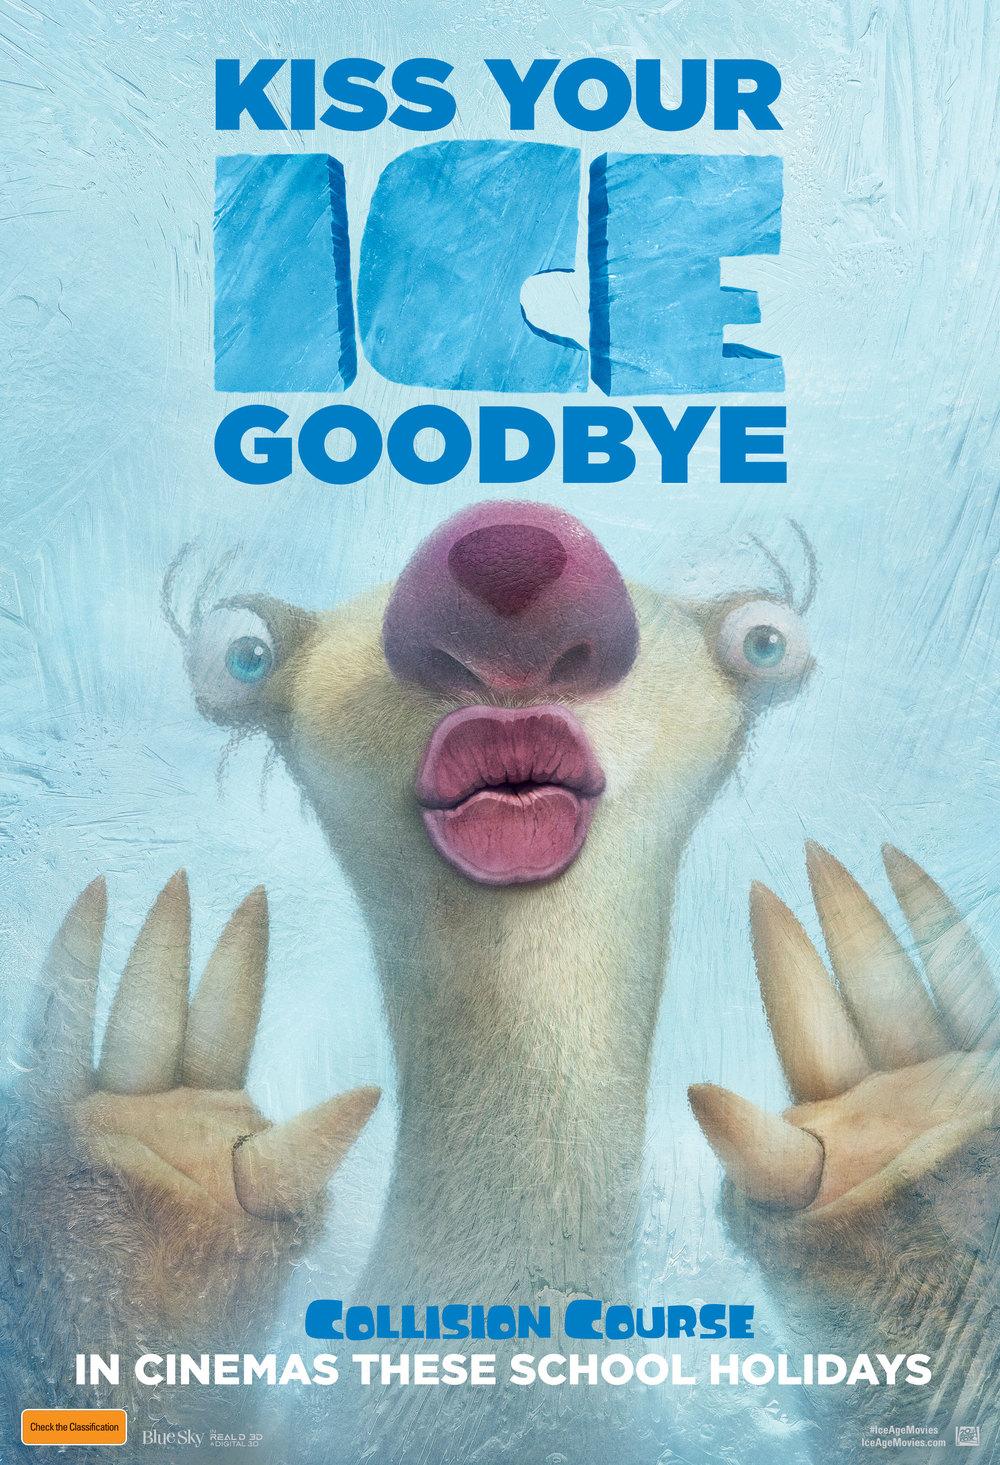 Ice Age Collision Course in Cinemas school holidays. Win movie tickets on www.mumscloset.com.au